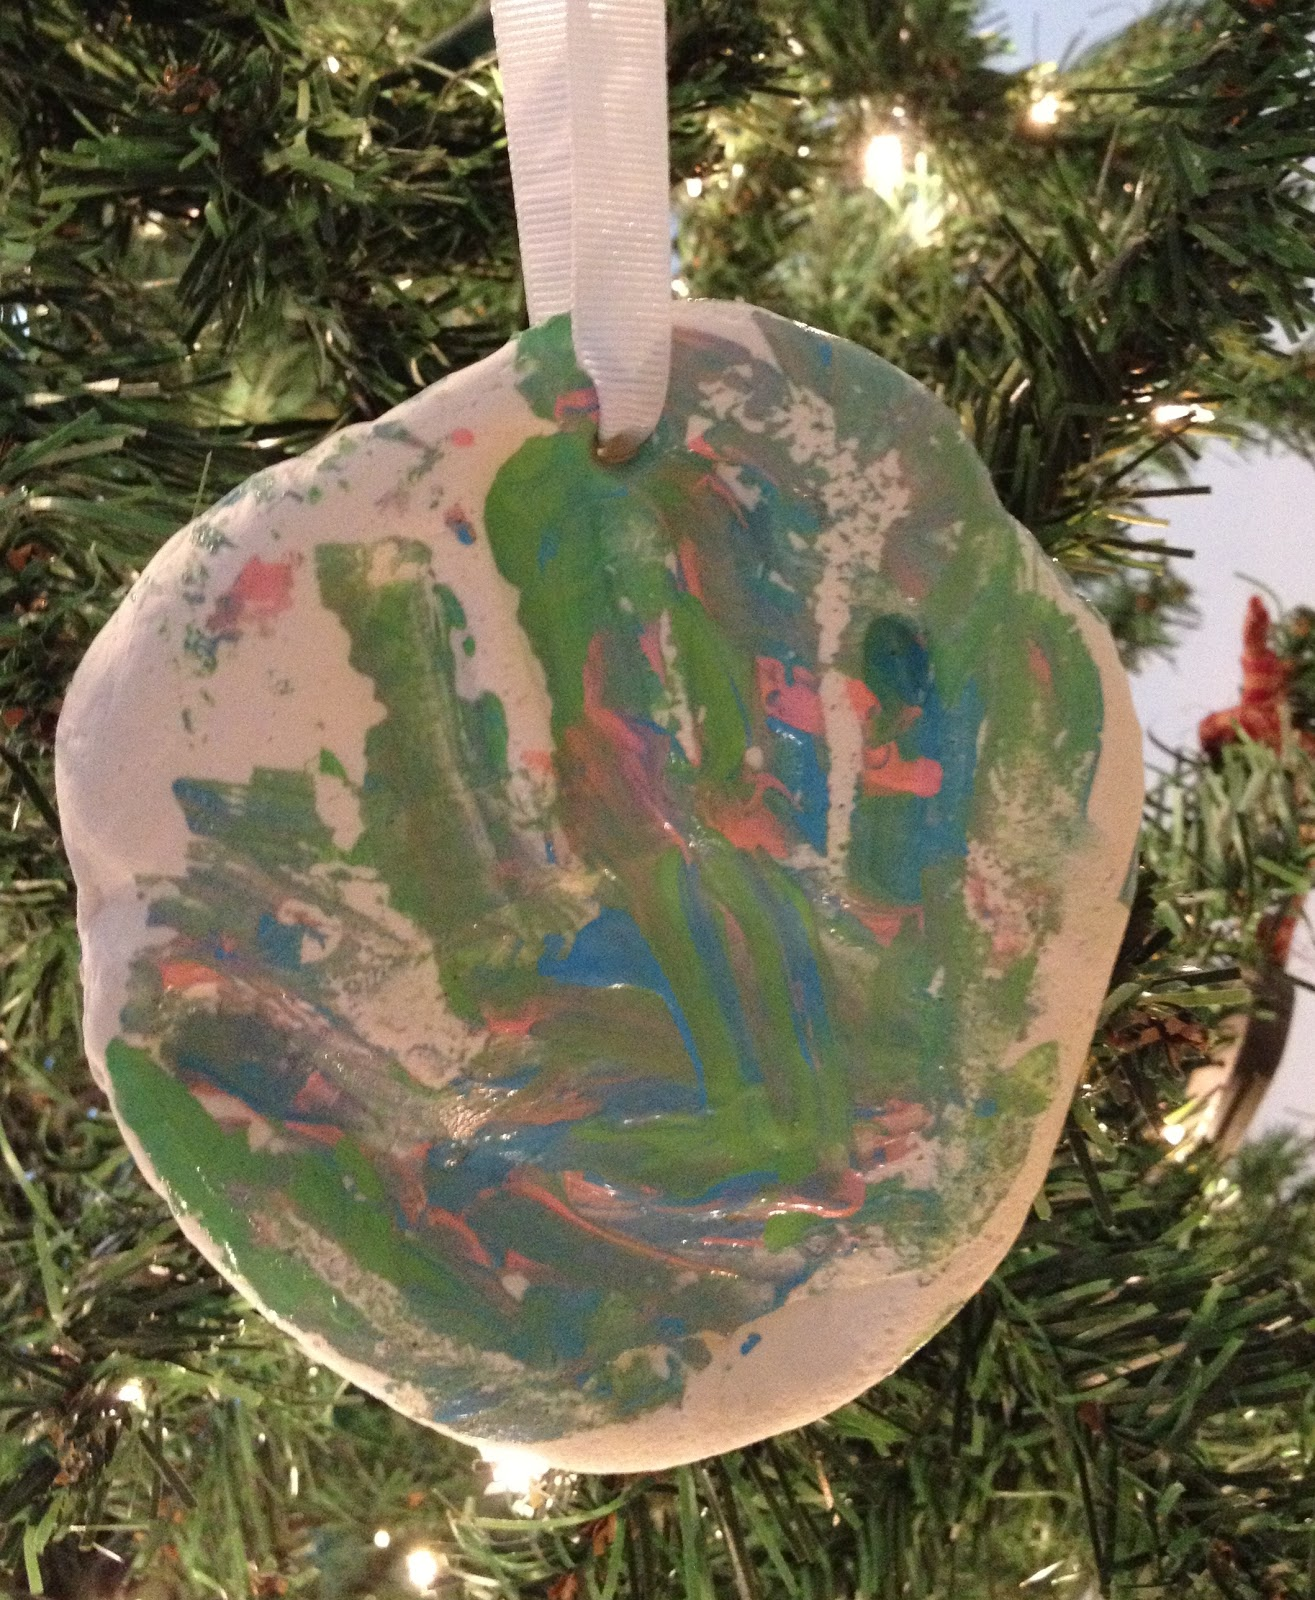 Hand Print Tree Ornament